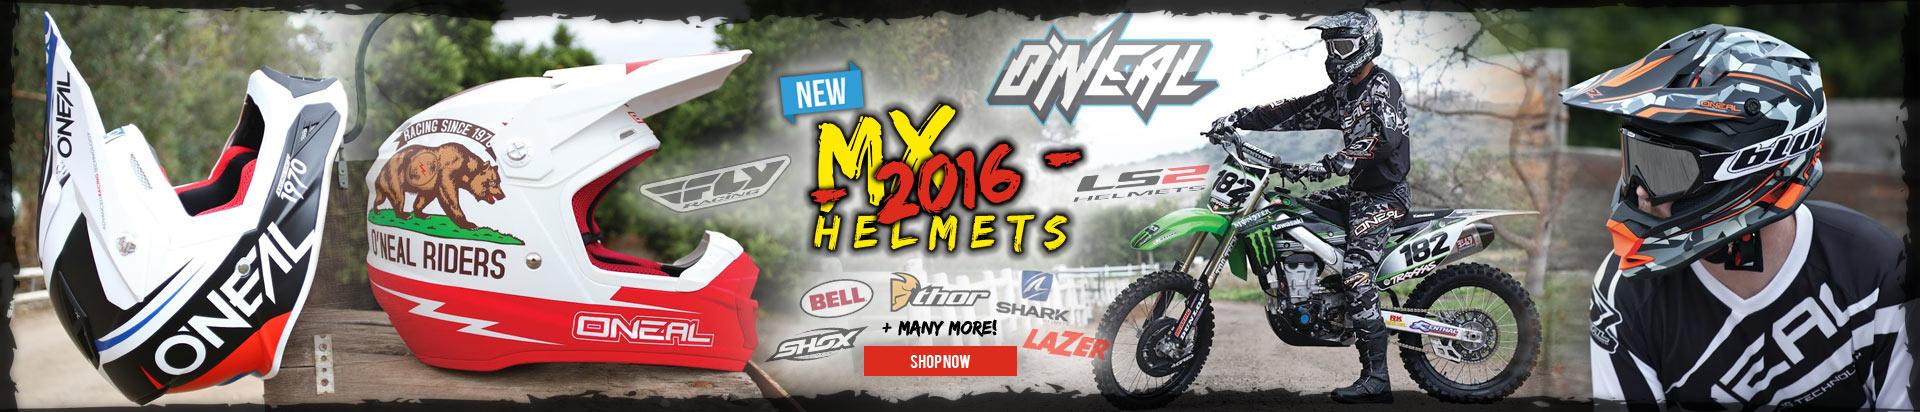 2016 Motocross Helmets